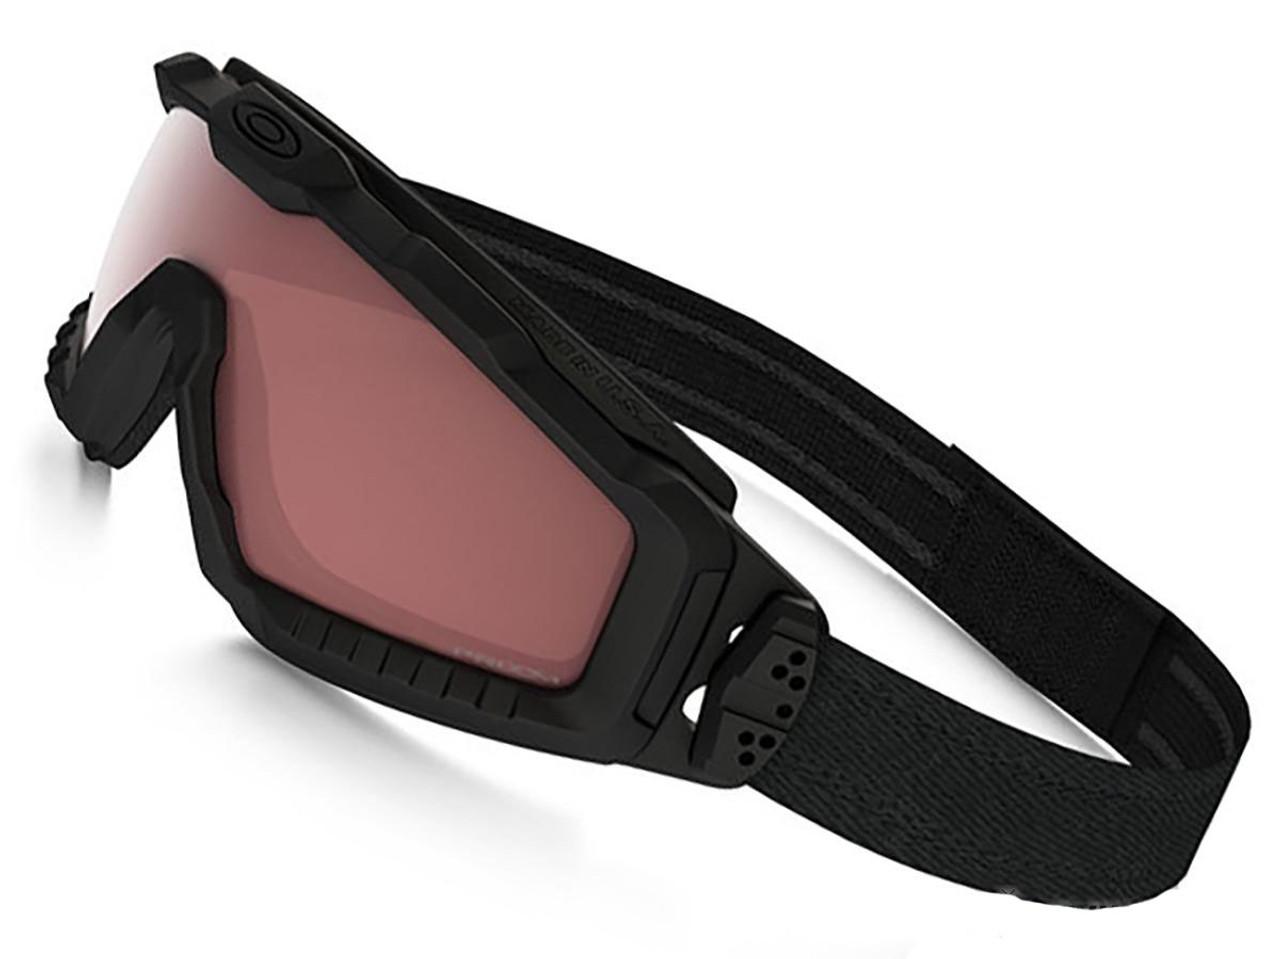 de8760962a Oakley SI Ballistic ALPHA Halo Full Seal Goggle - Matte Black with TR45  Tinter Iridium Lens